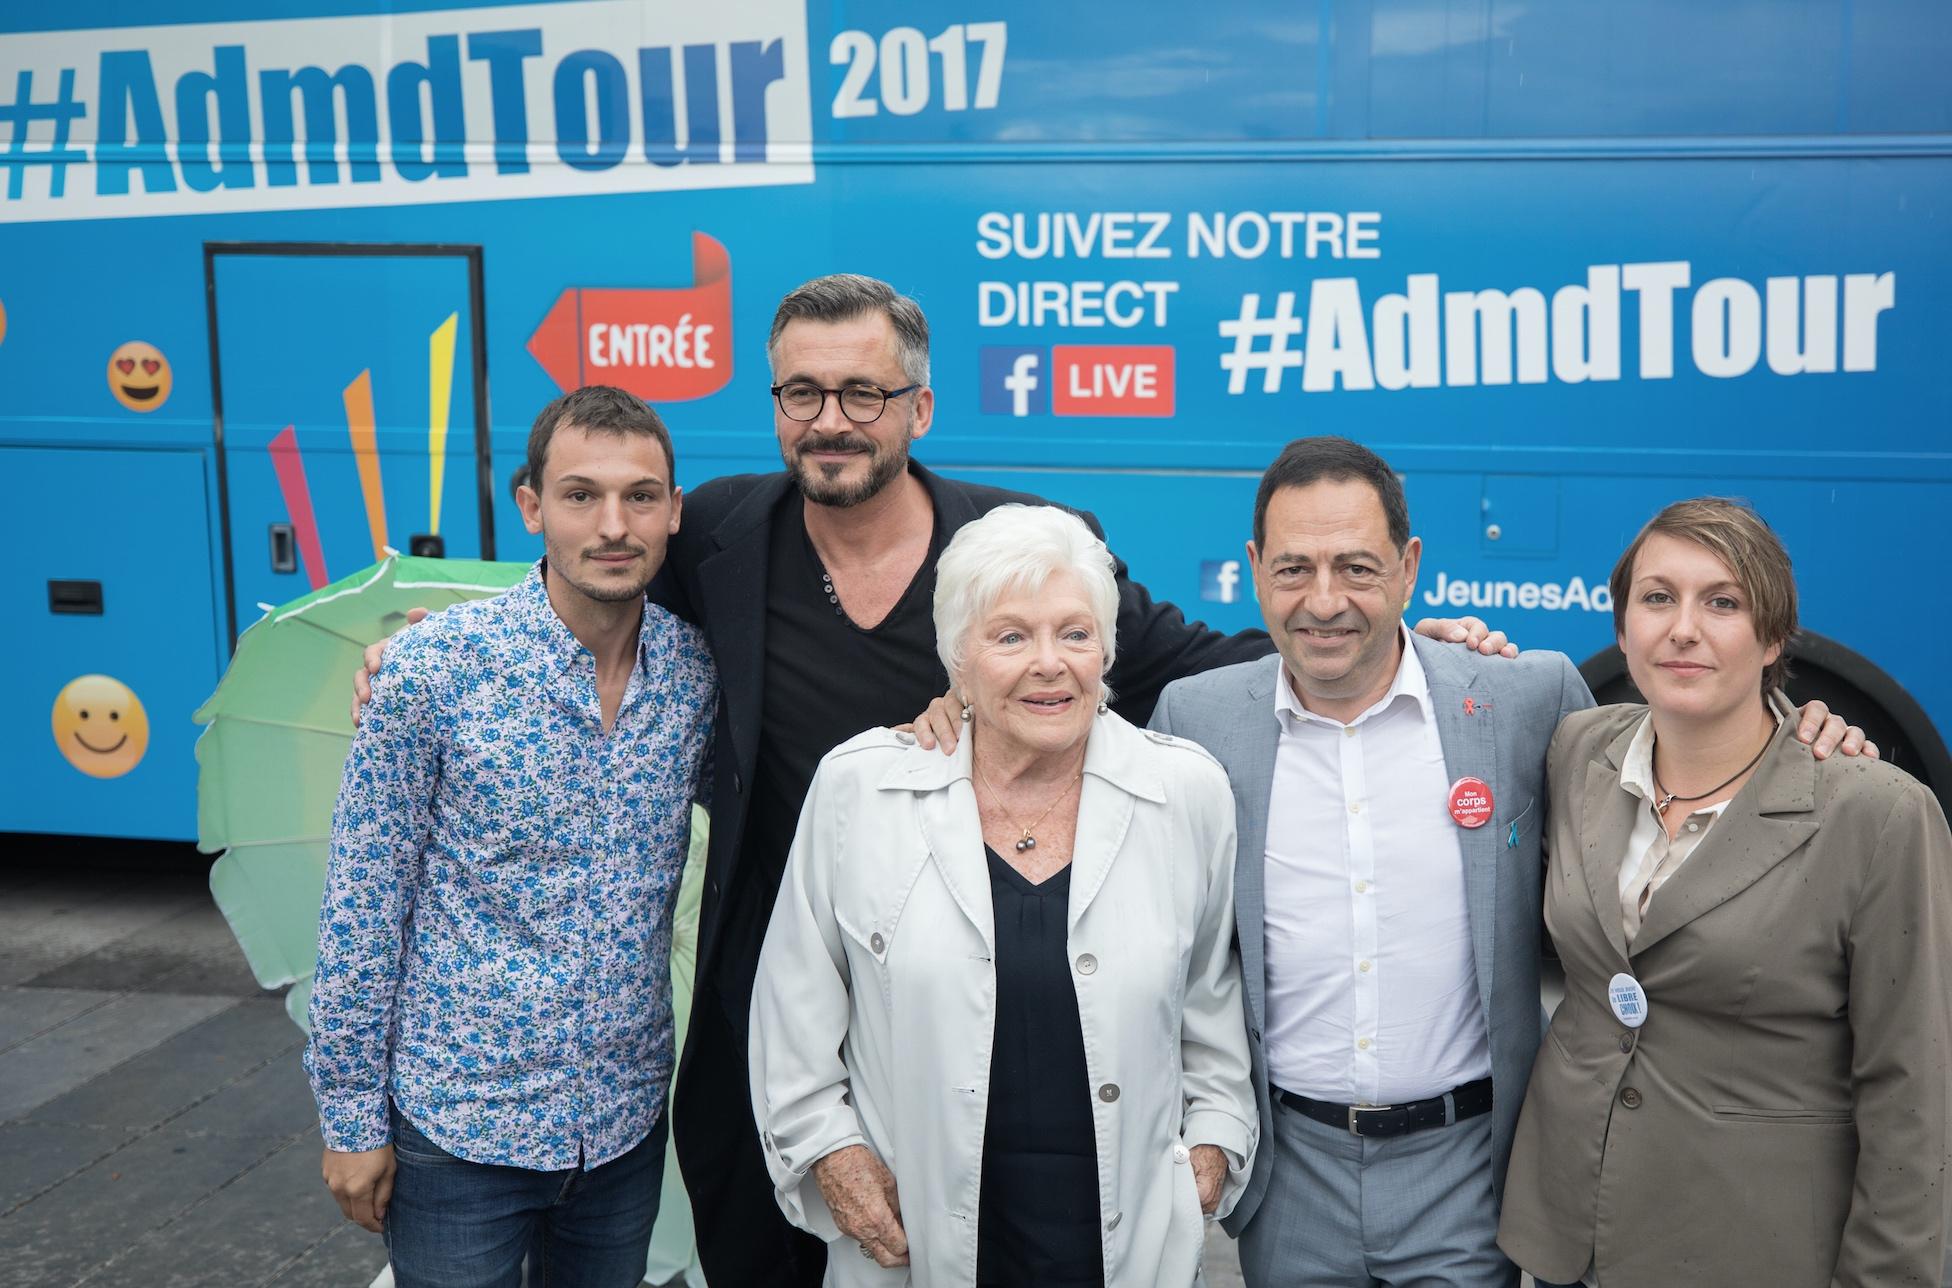 Ici avec Christophe Michel, Olivier Minne, Line Renaud, JLR, et Mélanie Raphael-Béthune